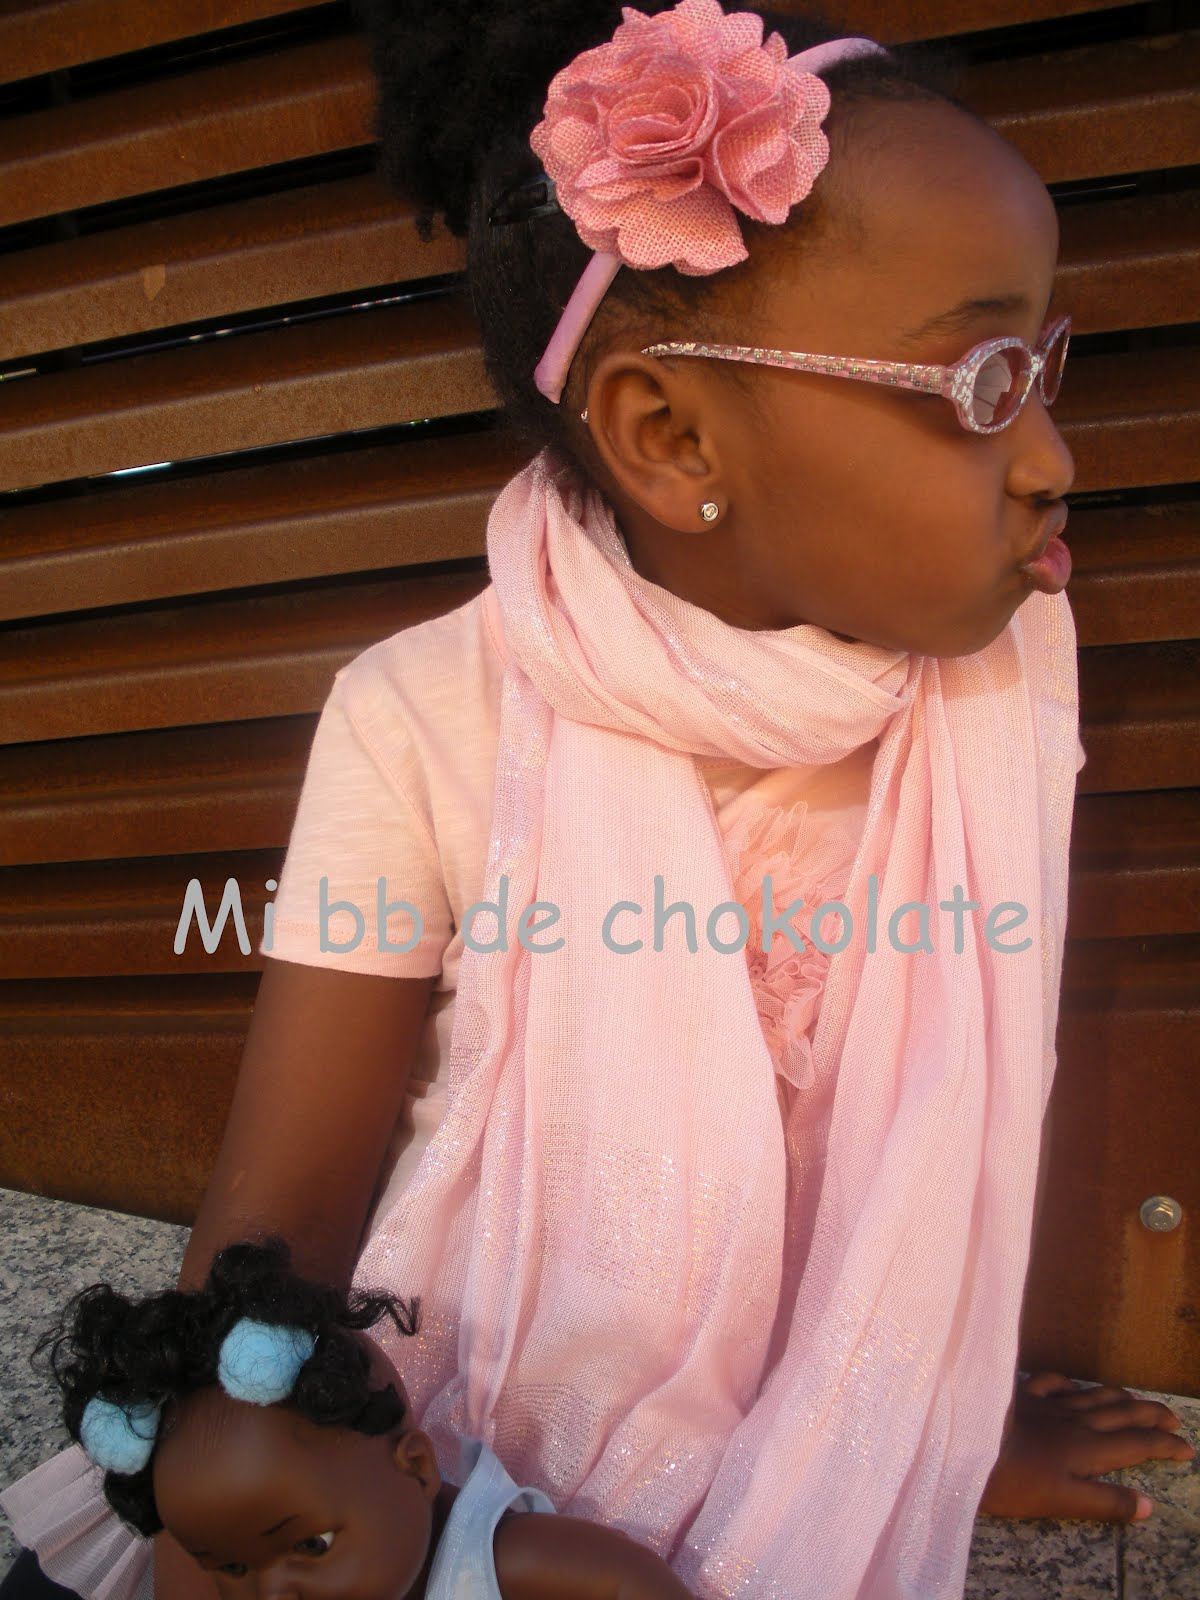 dfb0ab9669646 Mi bebé de chokolate  marzo 2012